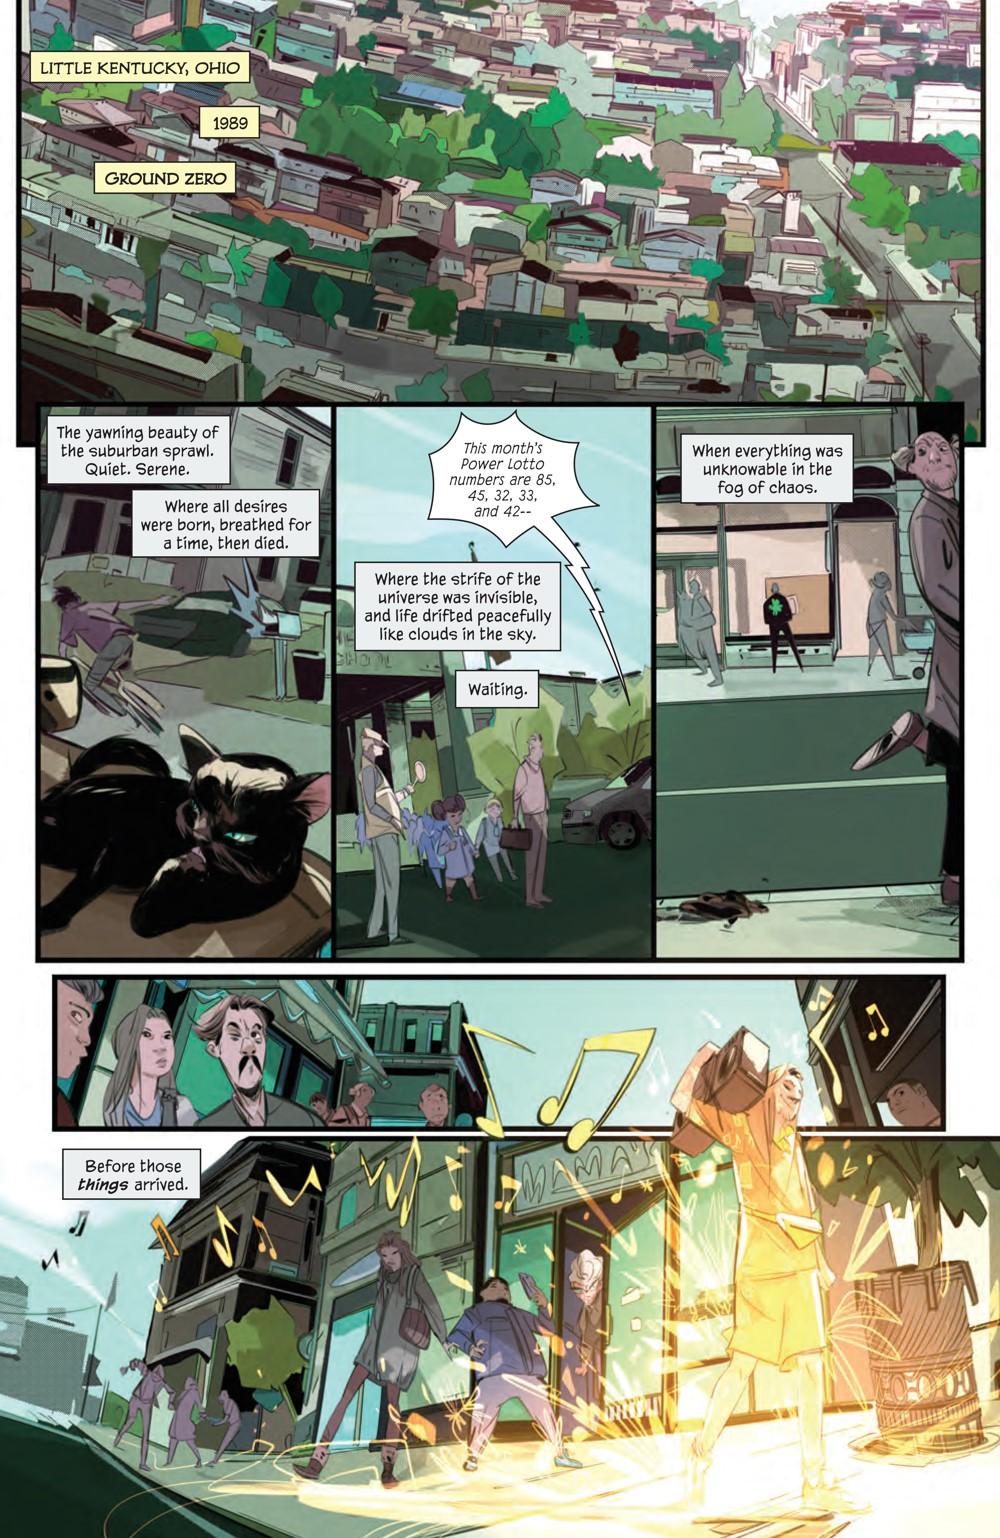 GoodLuck_001_PRESS_3 ComicList Previews: GOOD LUCK #1 (OF 5)